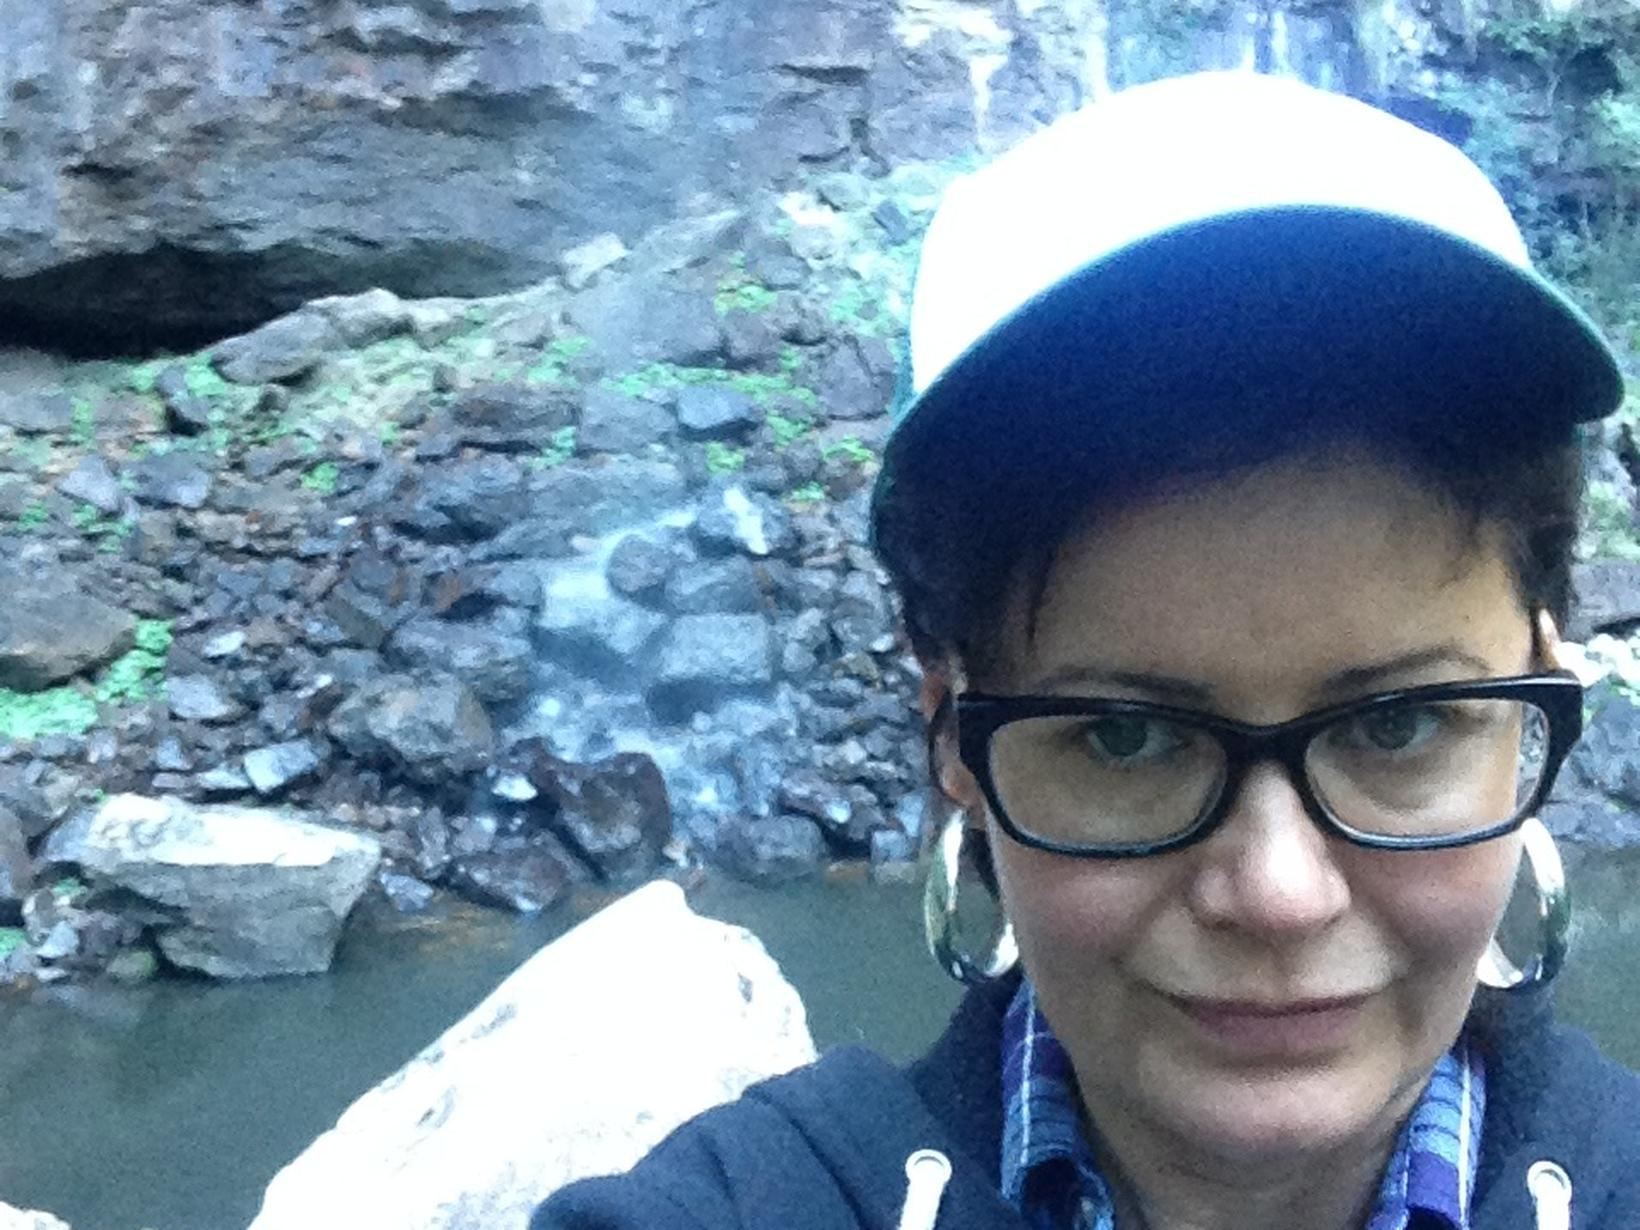 Megan from Sydney, New South Wales, Australia